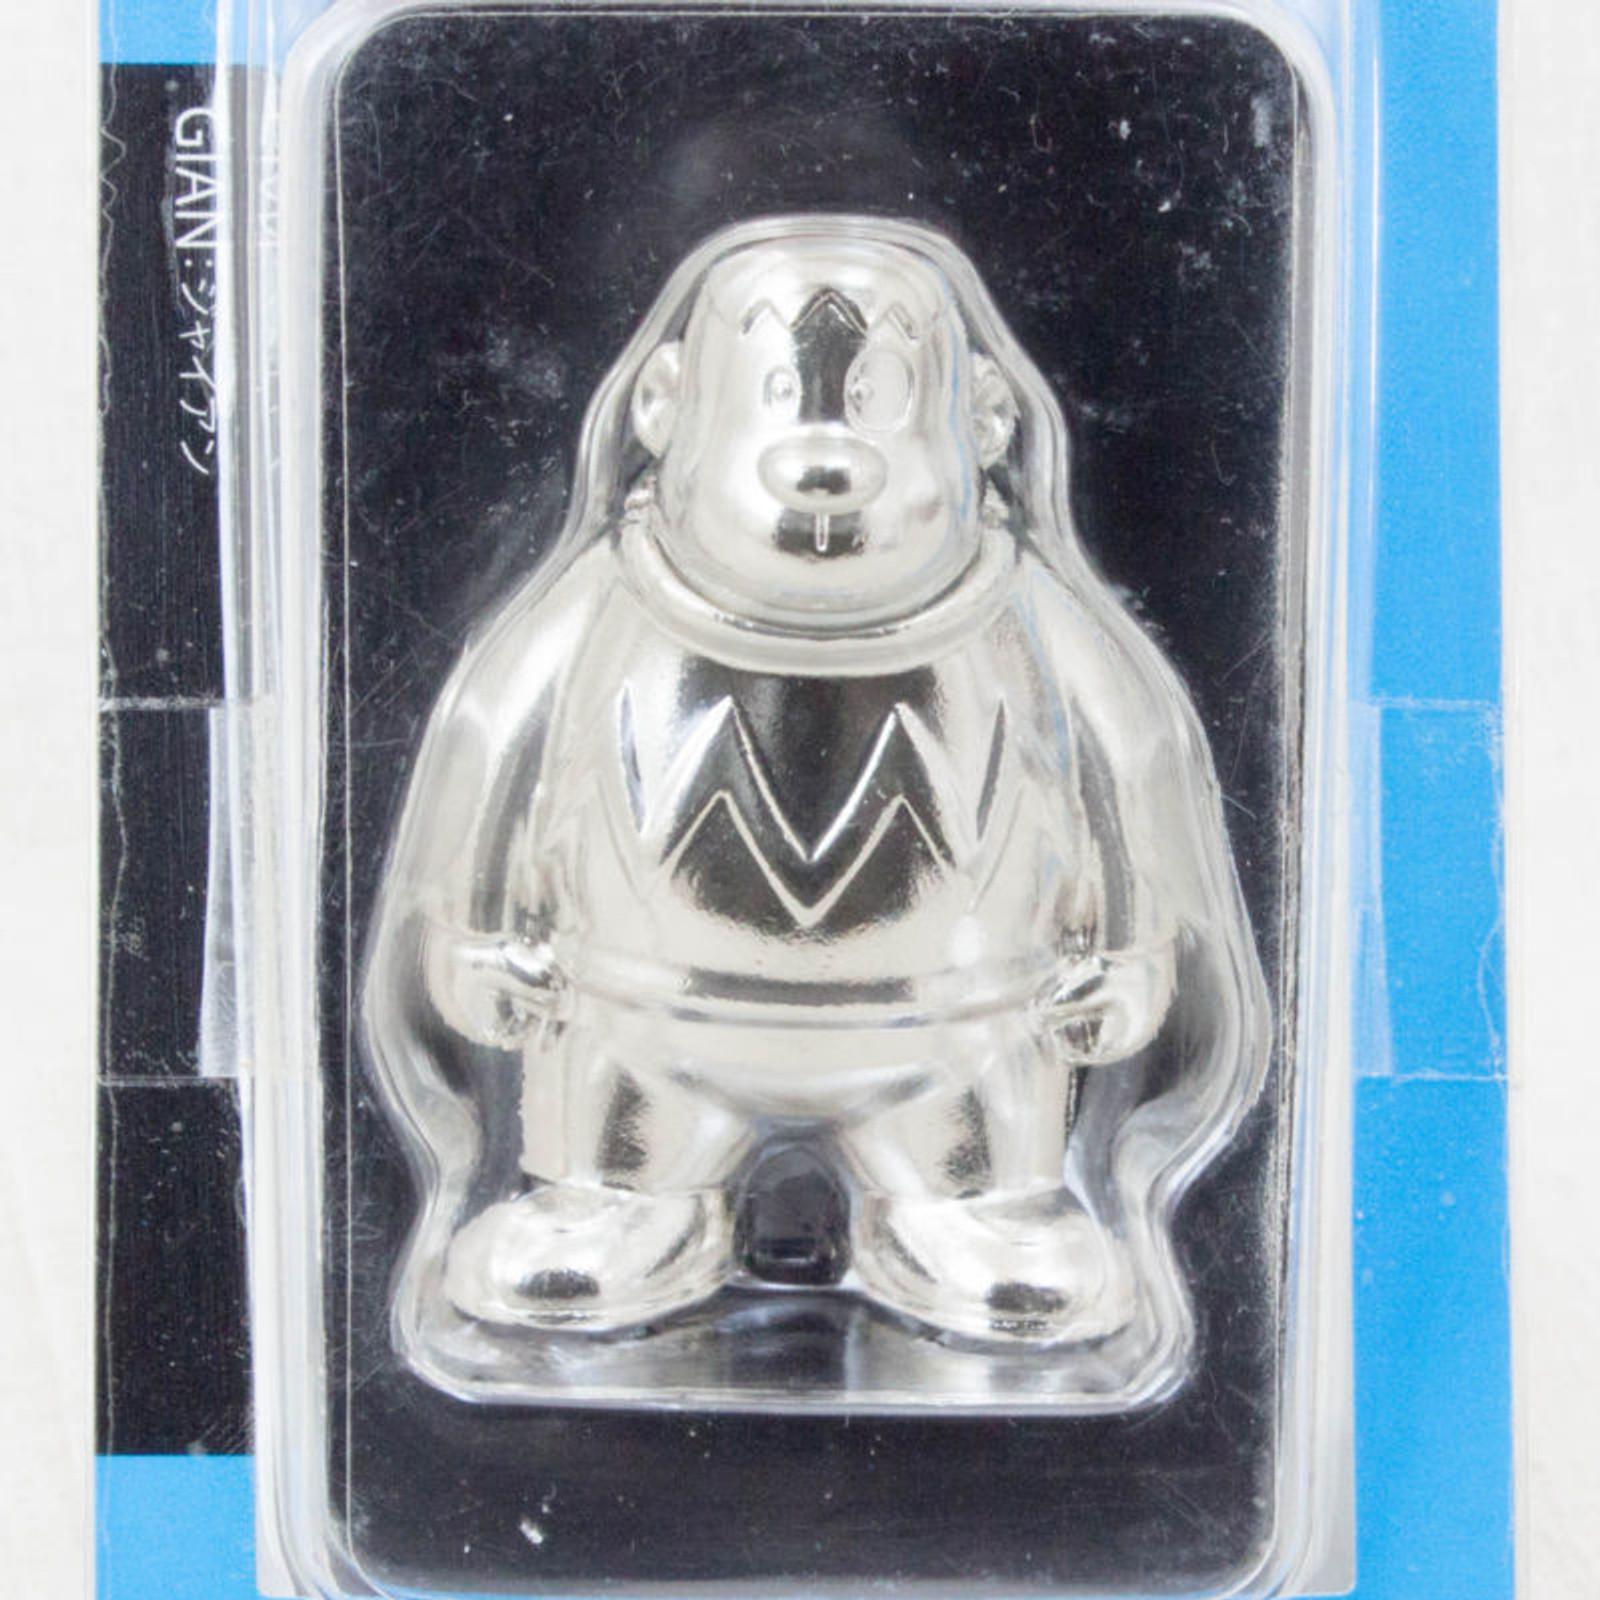 Doraemon Gian Absolute Chogokin Mini Figure BANDAI JAPAN ANIME MANGA